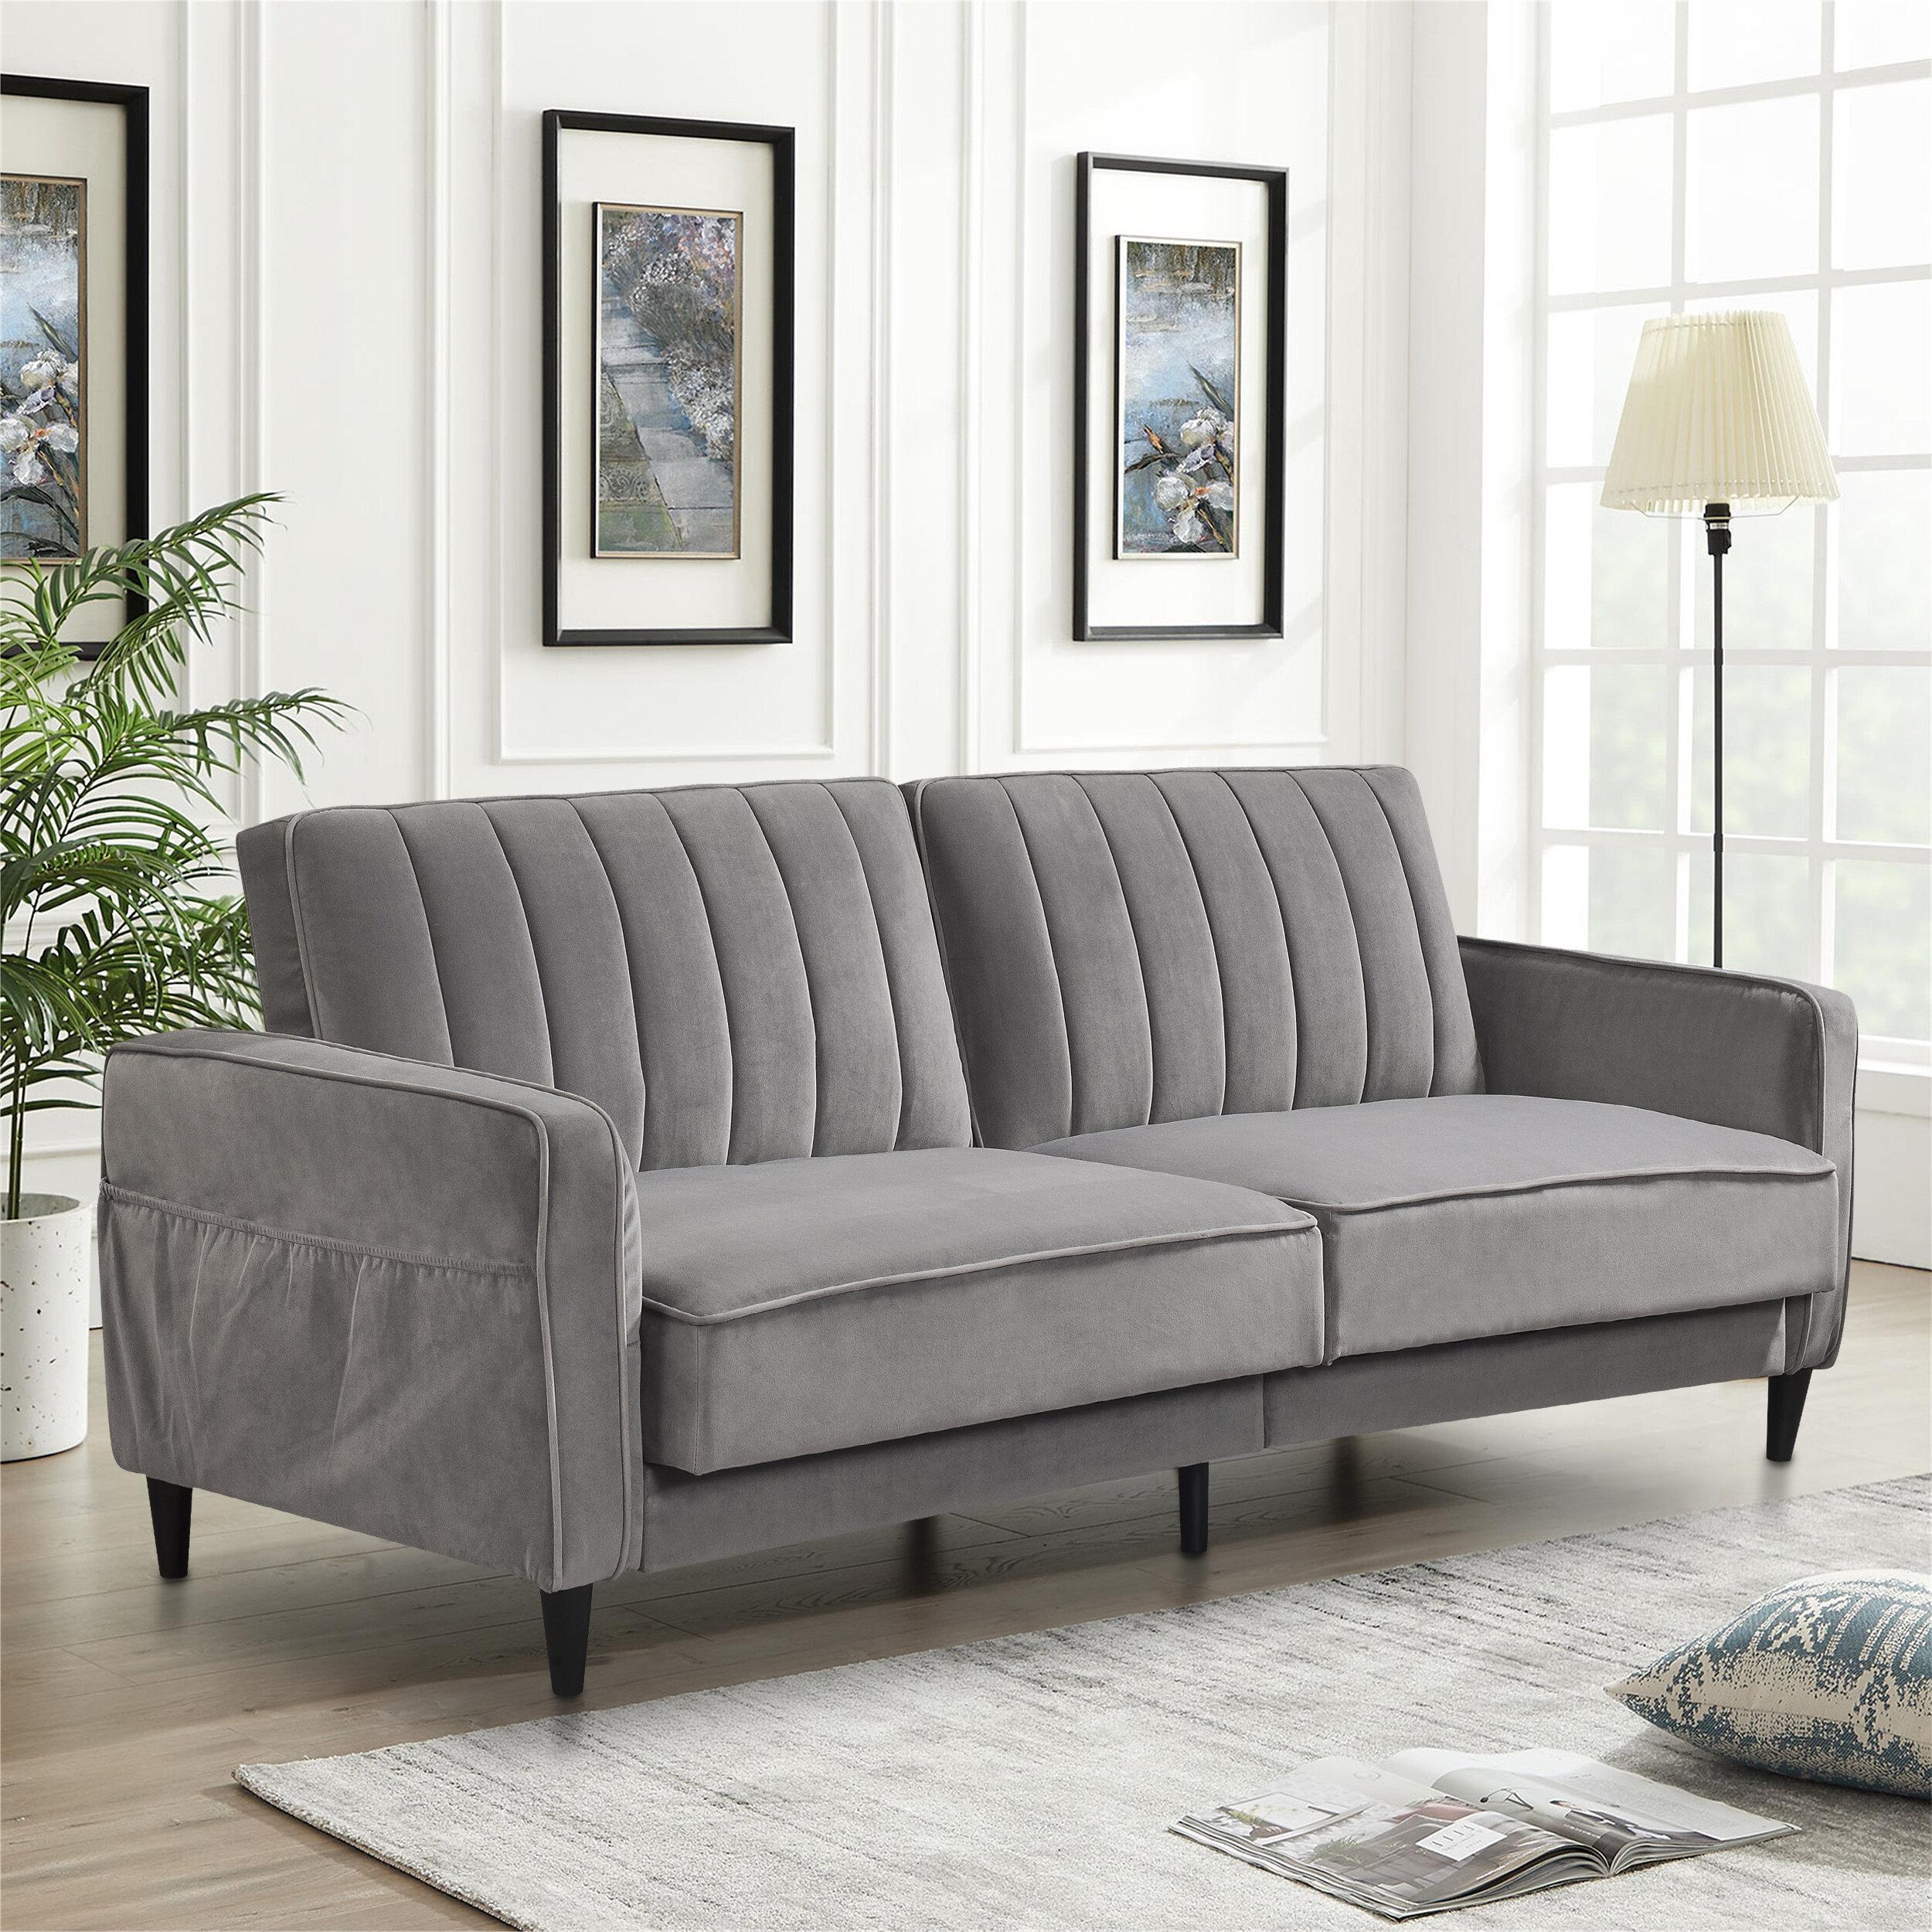 Corrigan Studio Gardin Twin Or Smaller 70 87 Split Back Convertible Sofa Wayfair